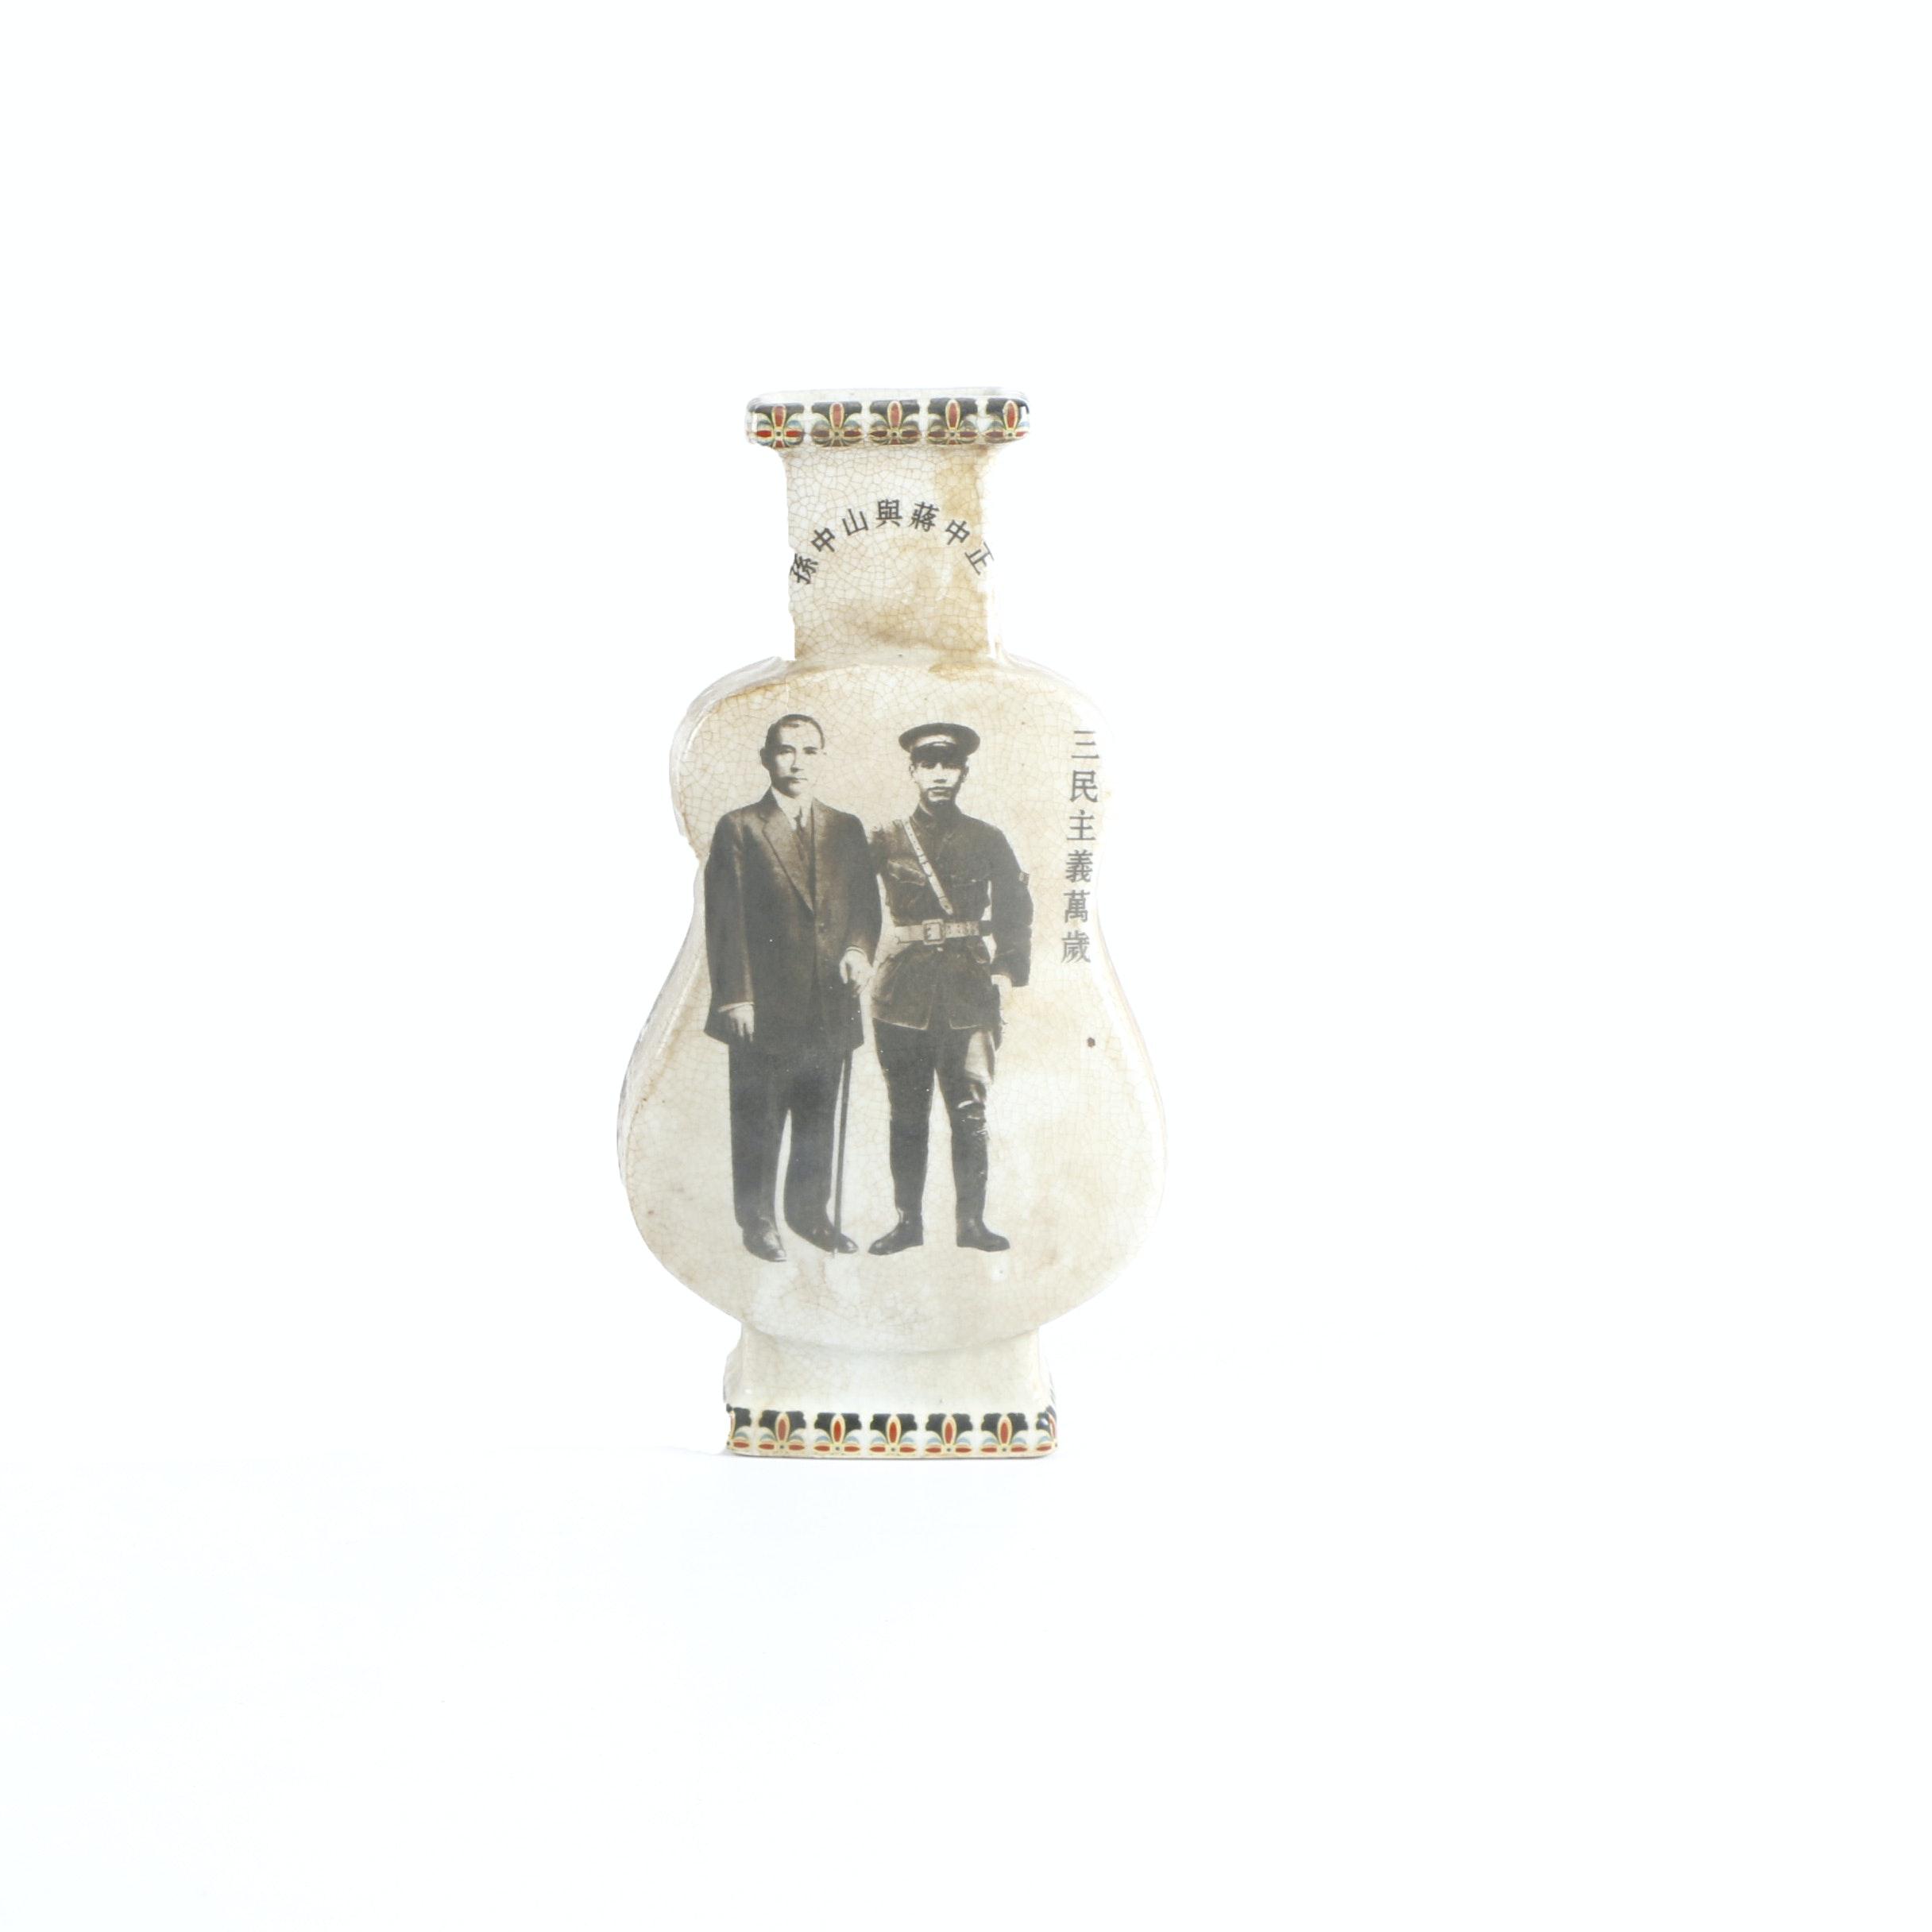 1924 Sun Yat-sen Commemorative Ceramic Vase